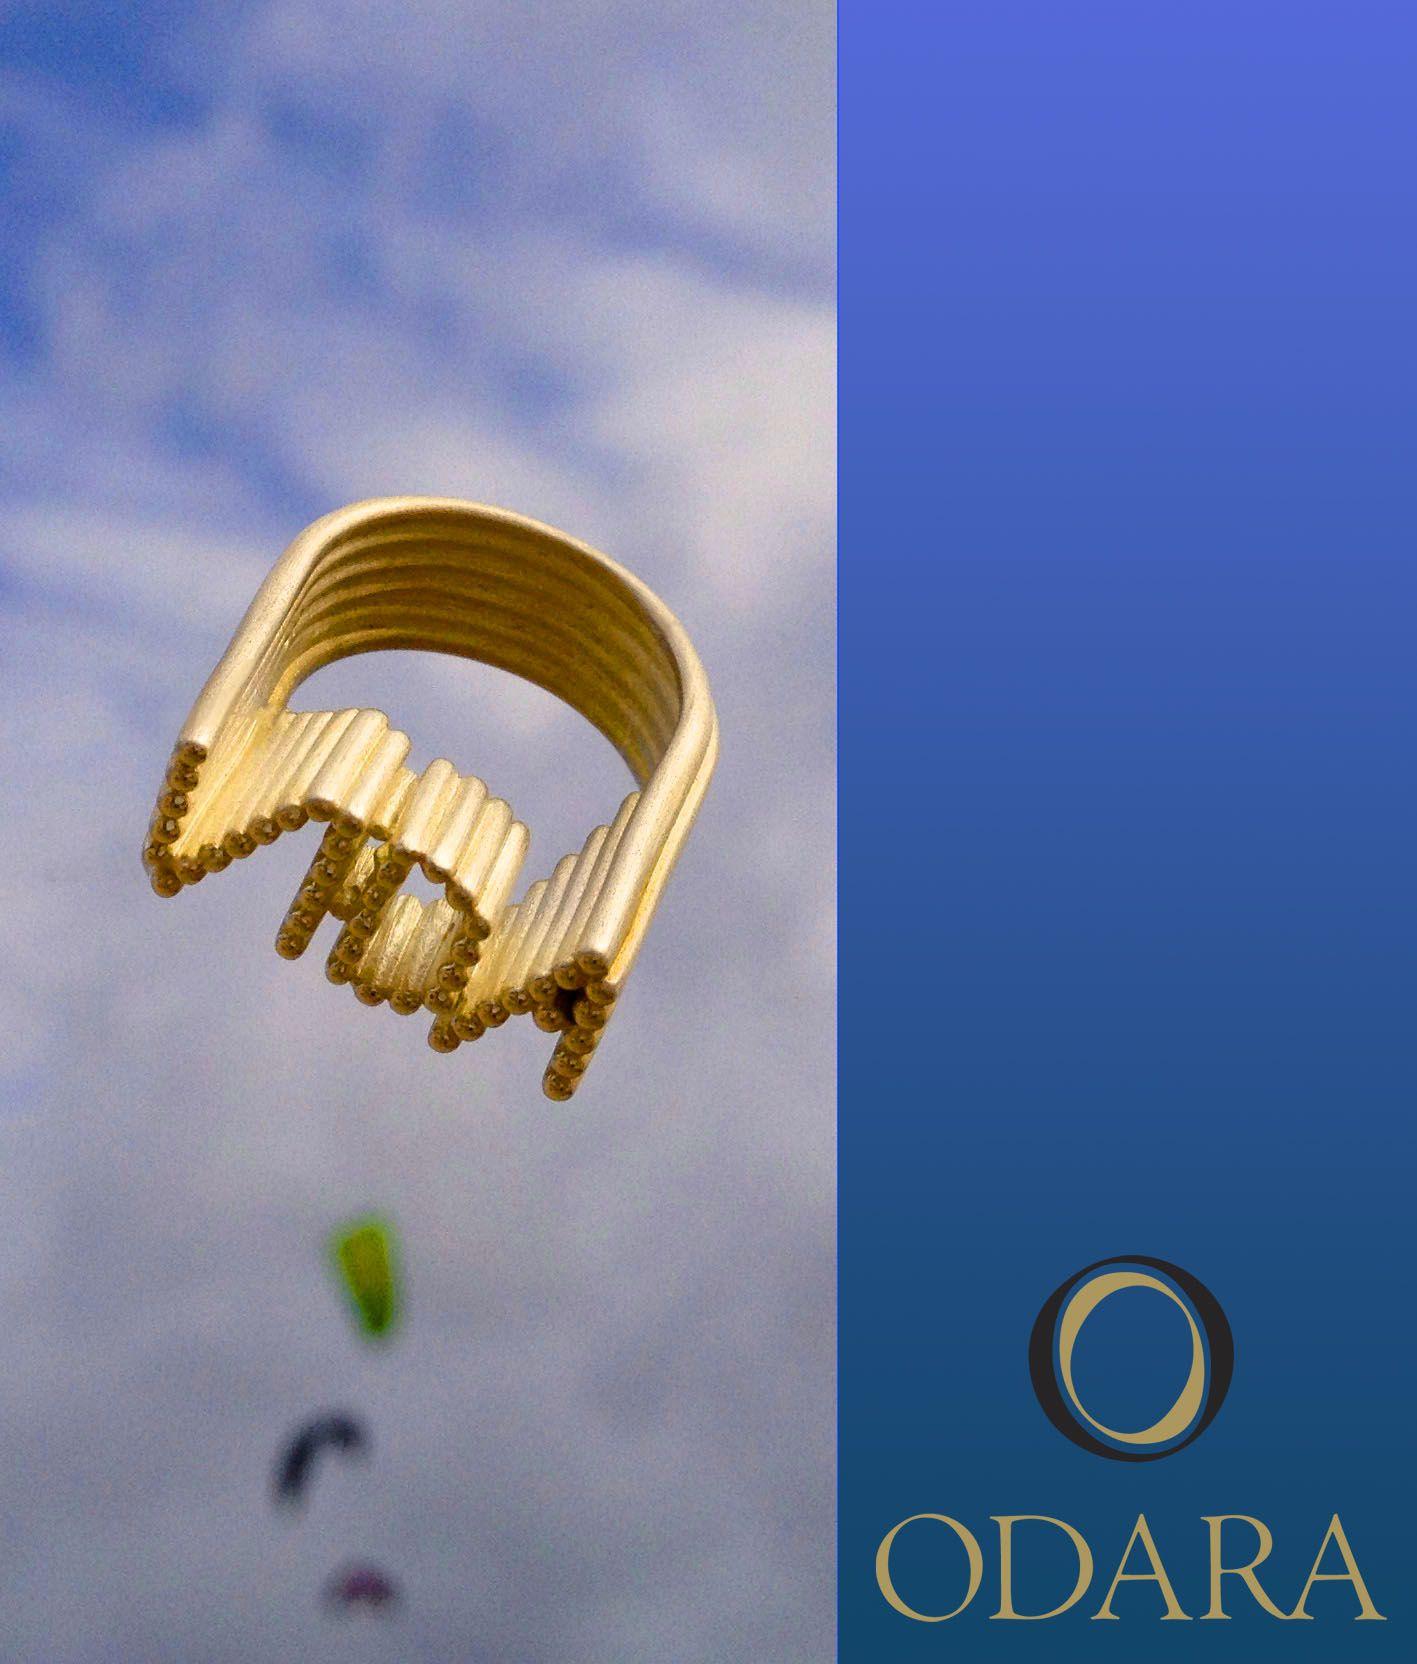 Vida Ring_18k gold.Design by odara.art.br 2013